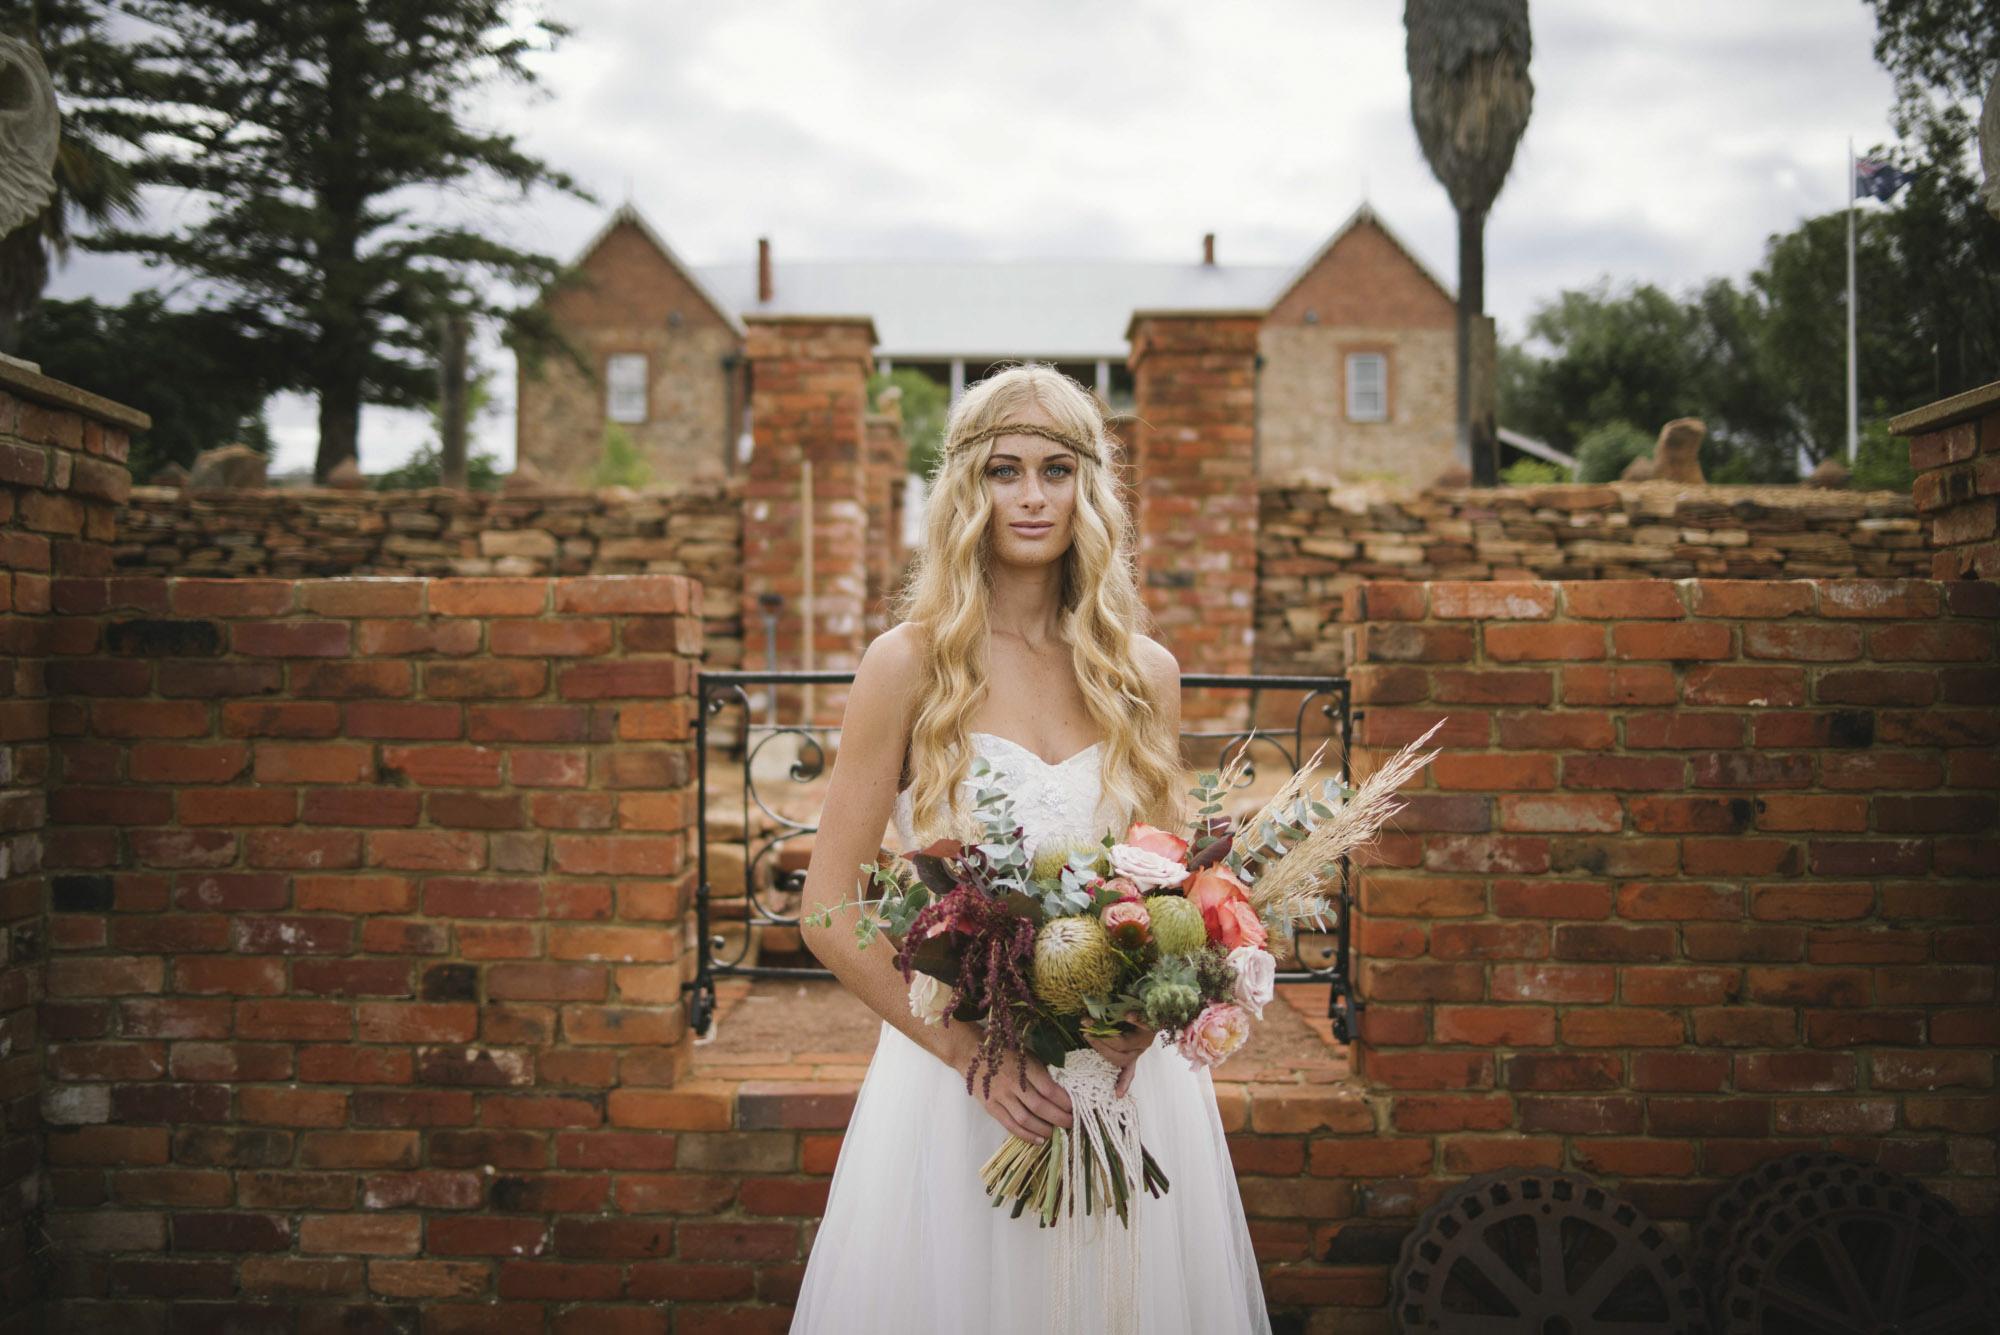 Angie-Roe-Photography-Wedding-Perth-Northam-Wheatbelt-Country-Rural (81).jpg